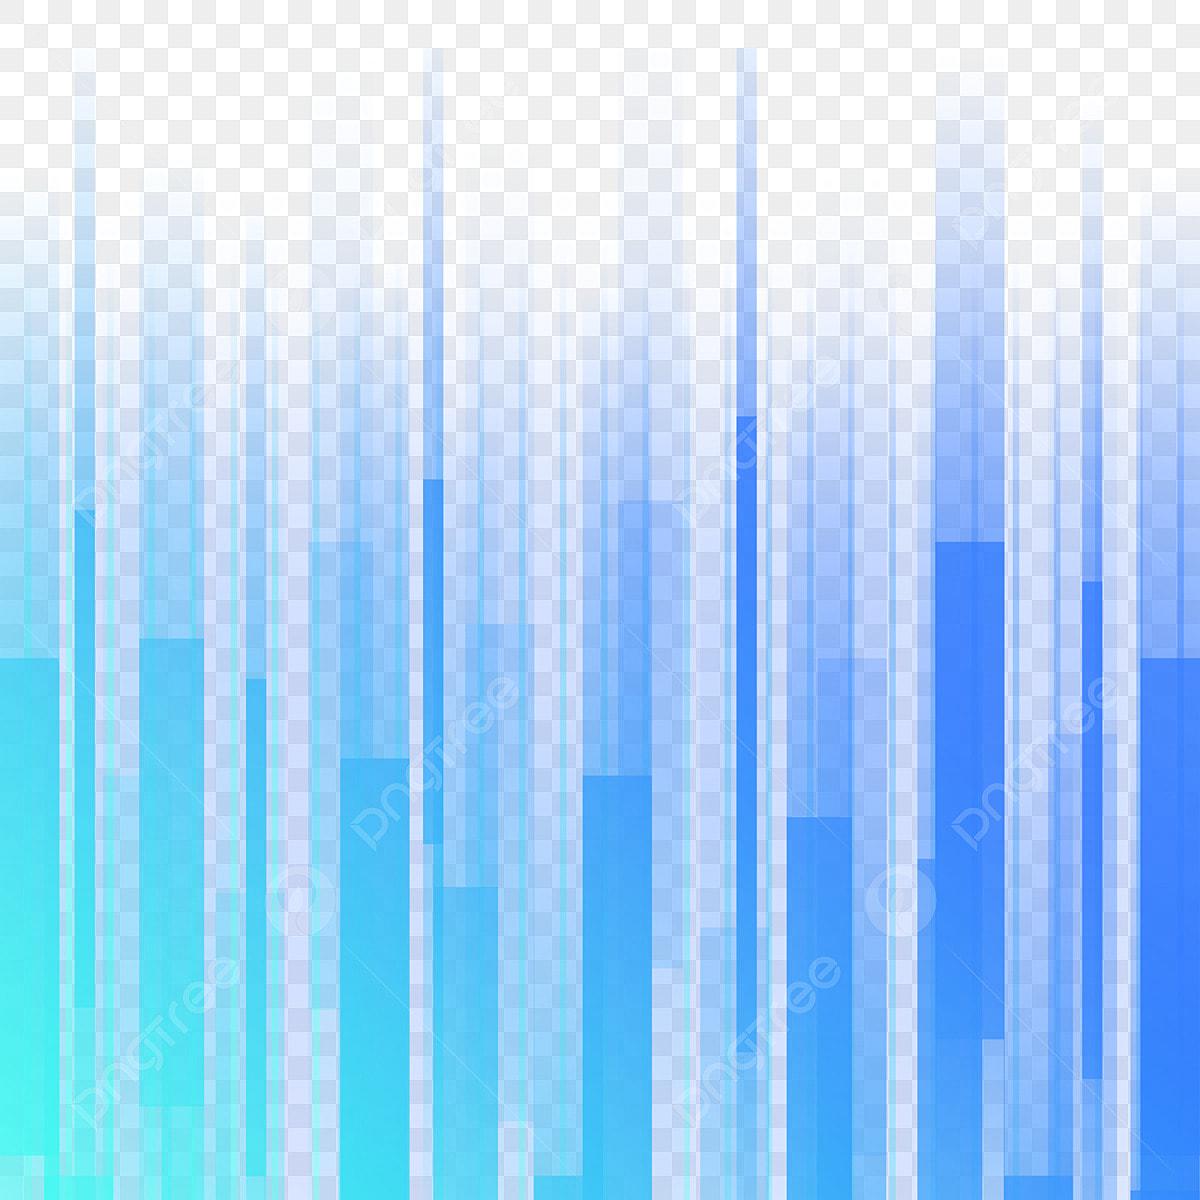 Shading Tech Blue Gradient Line Texture, Technology Lines